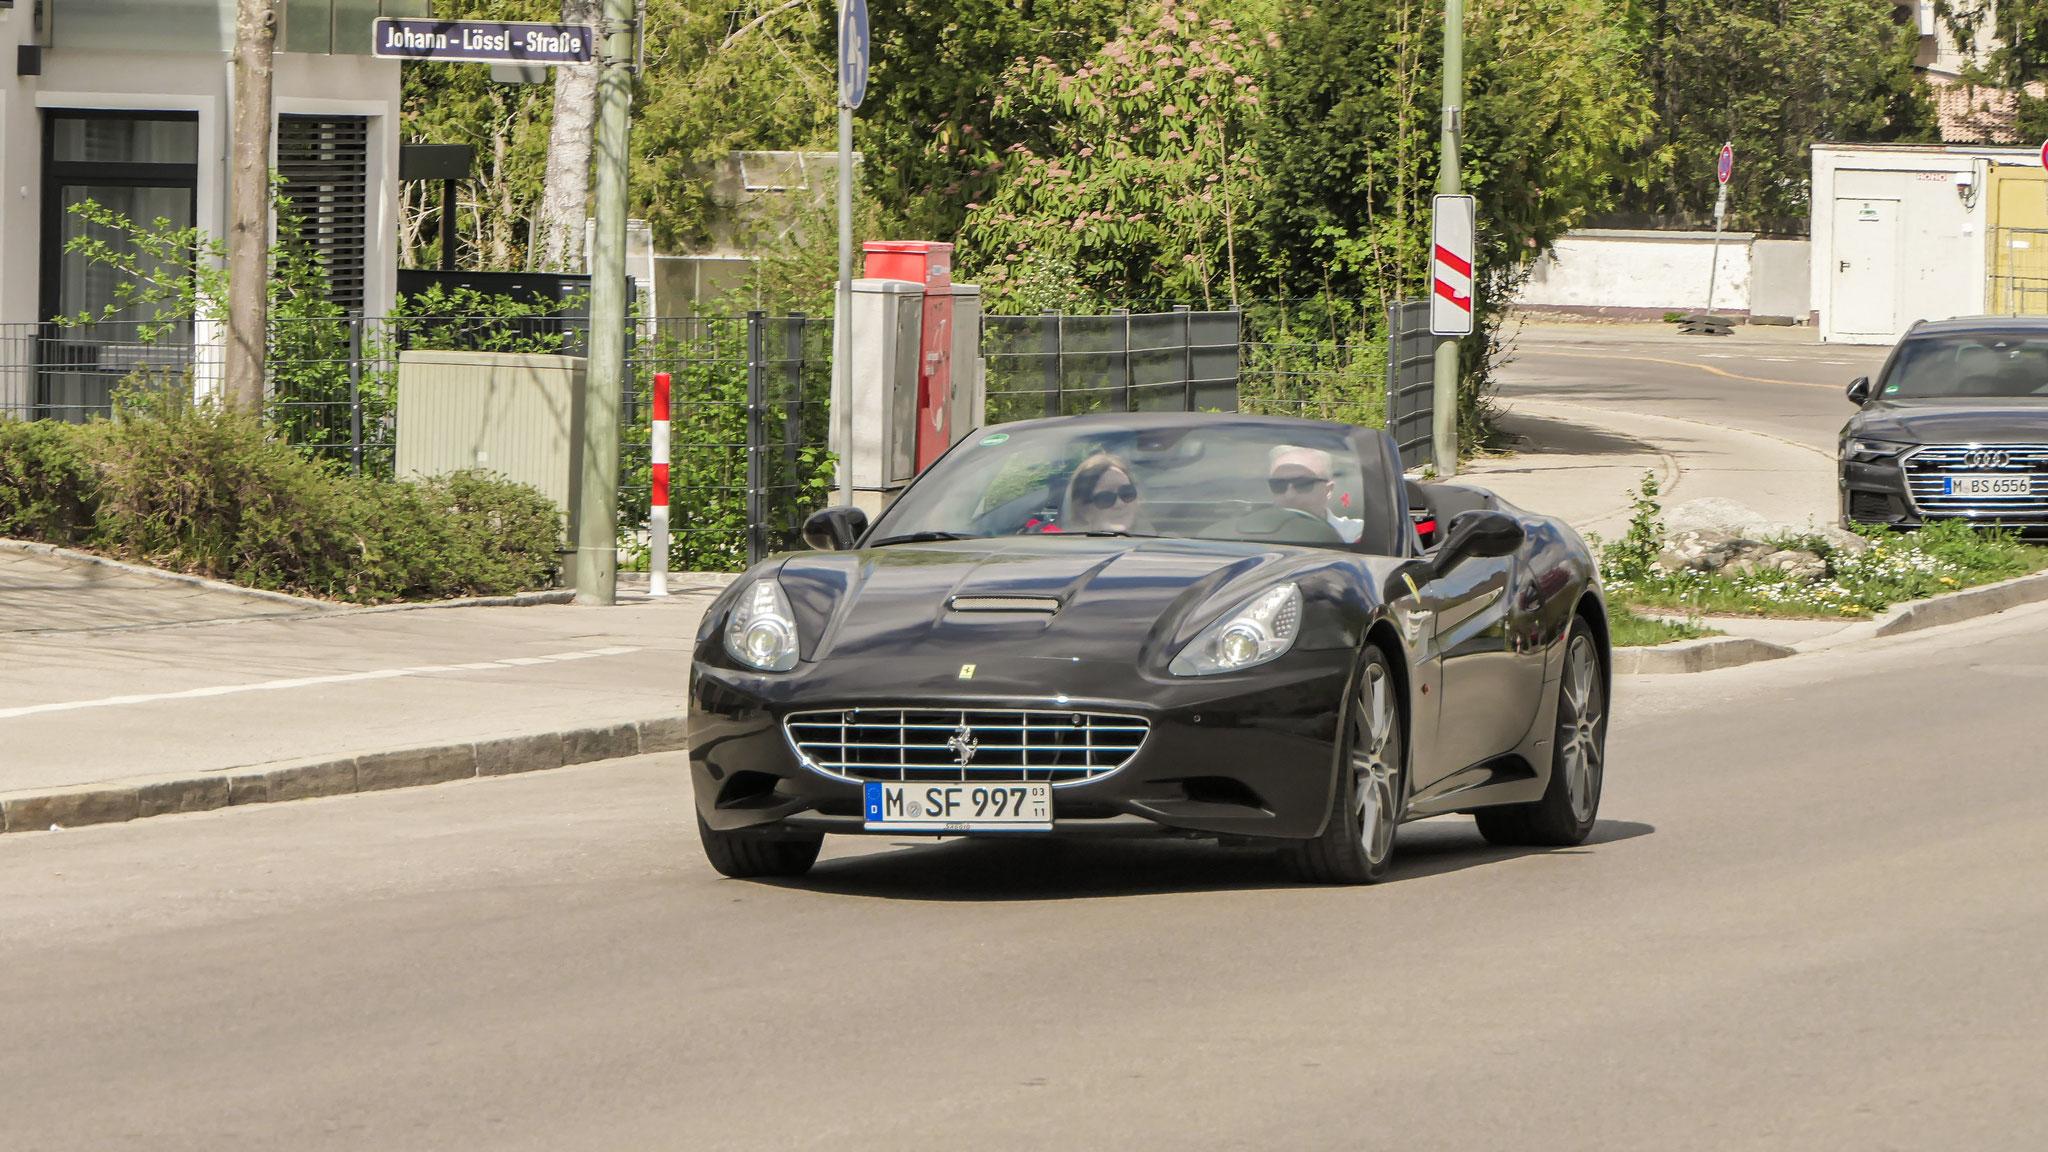 Ferrari California - M-SF-997